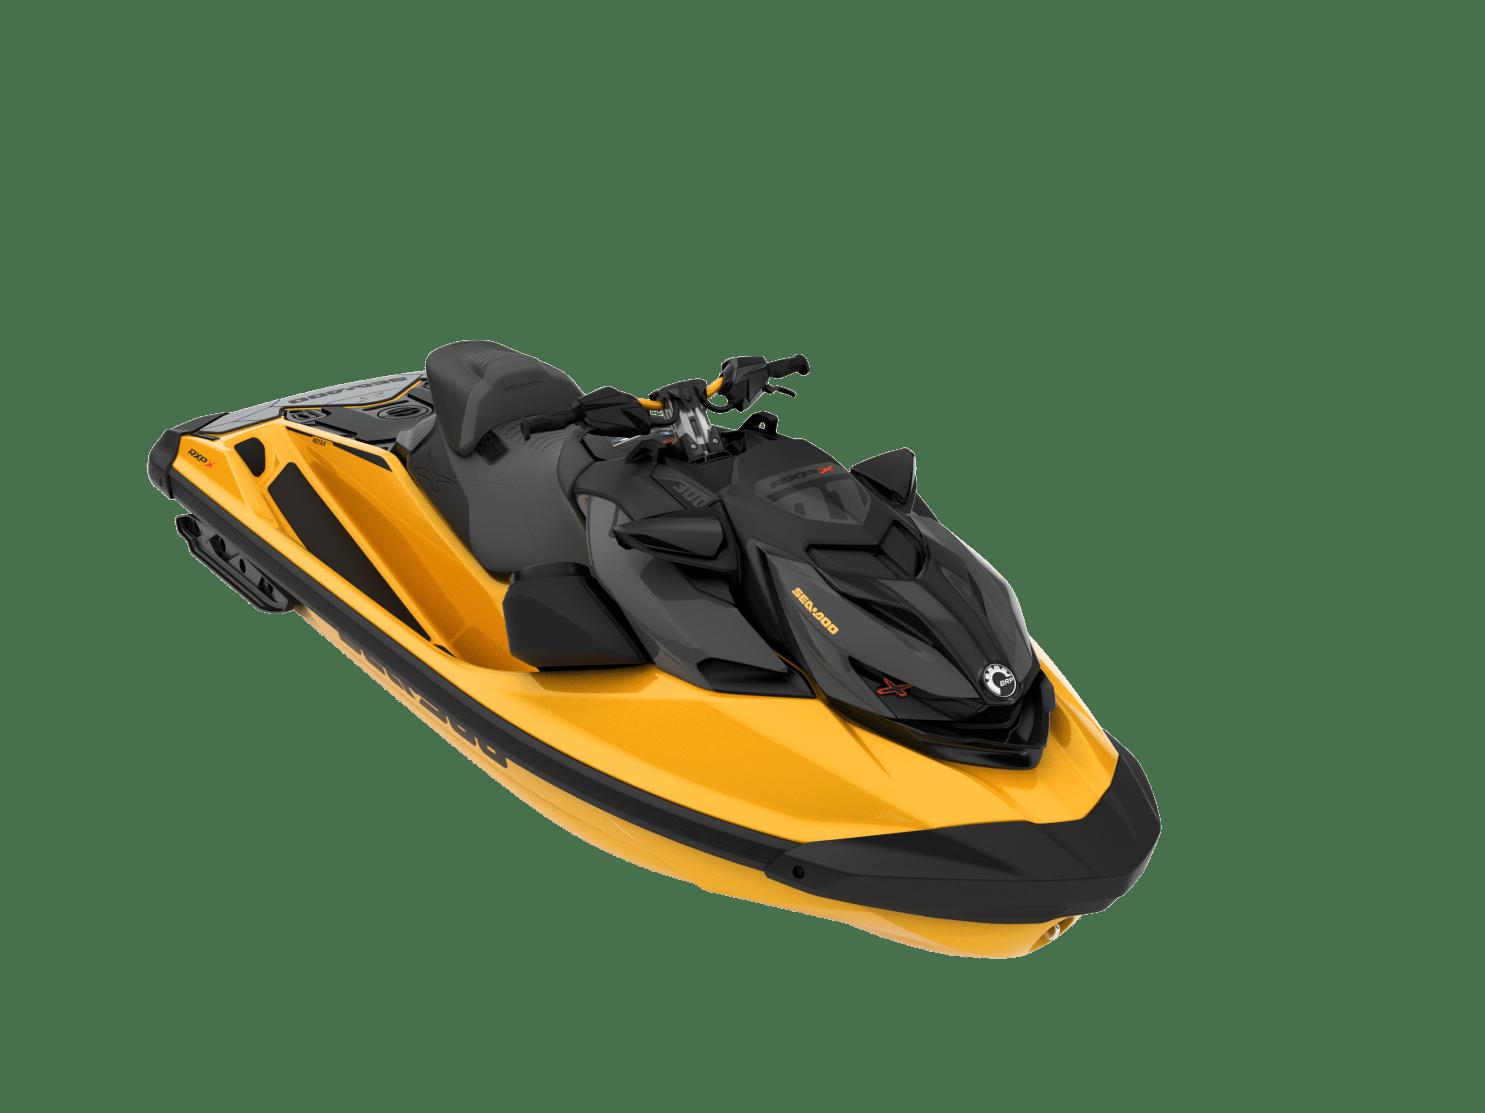 RXP-X 300 product image 3